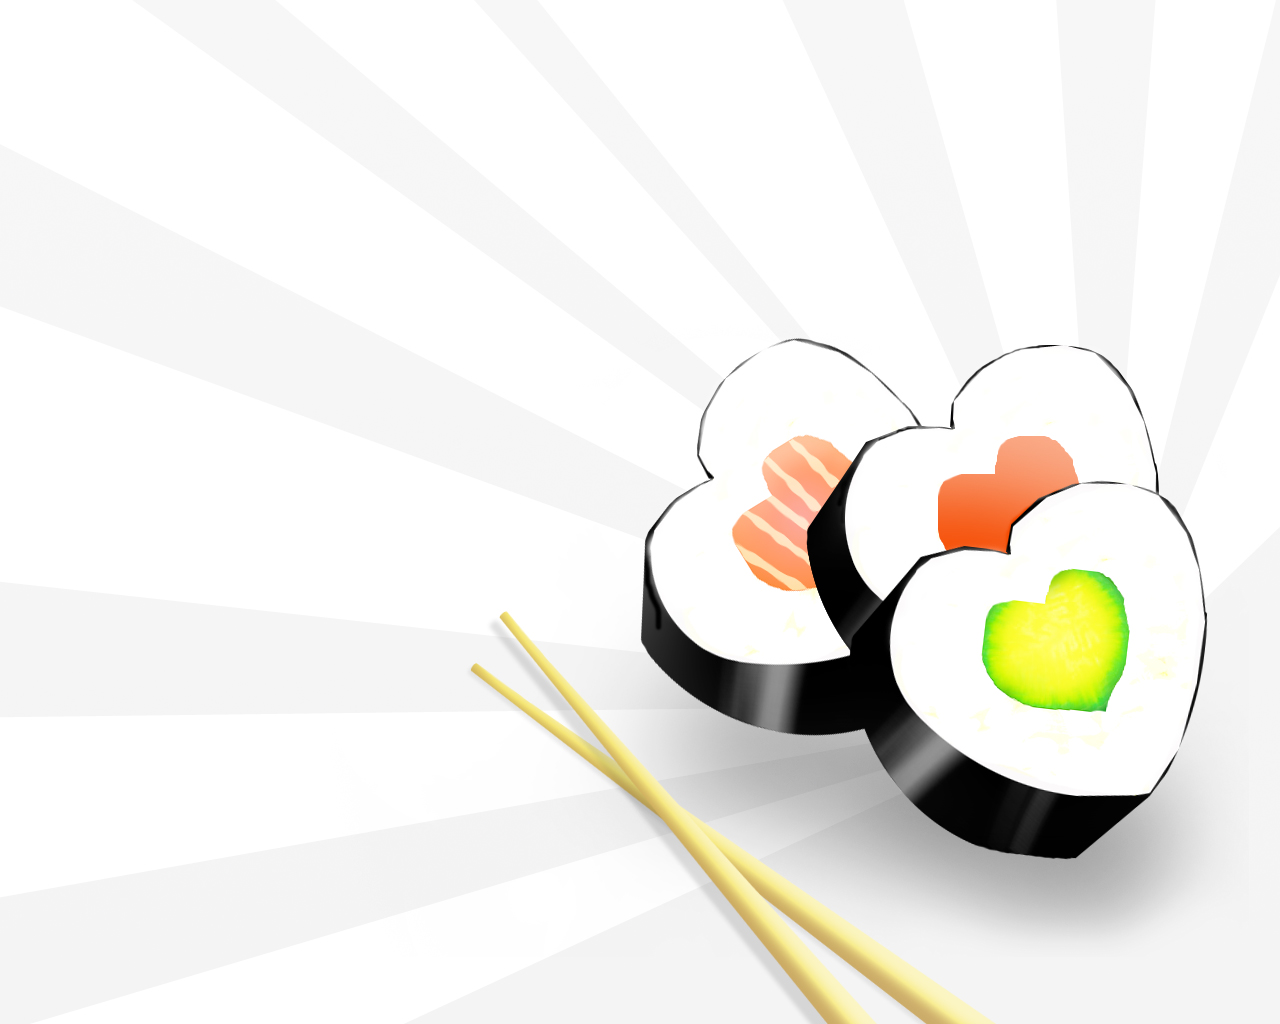 I Love Sushi Wallpapers I Love Sushi Backgrounds I Love 1280x1024